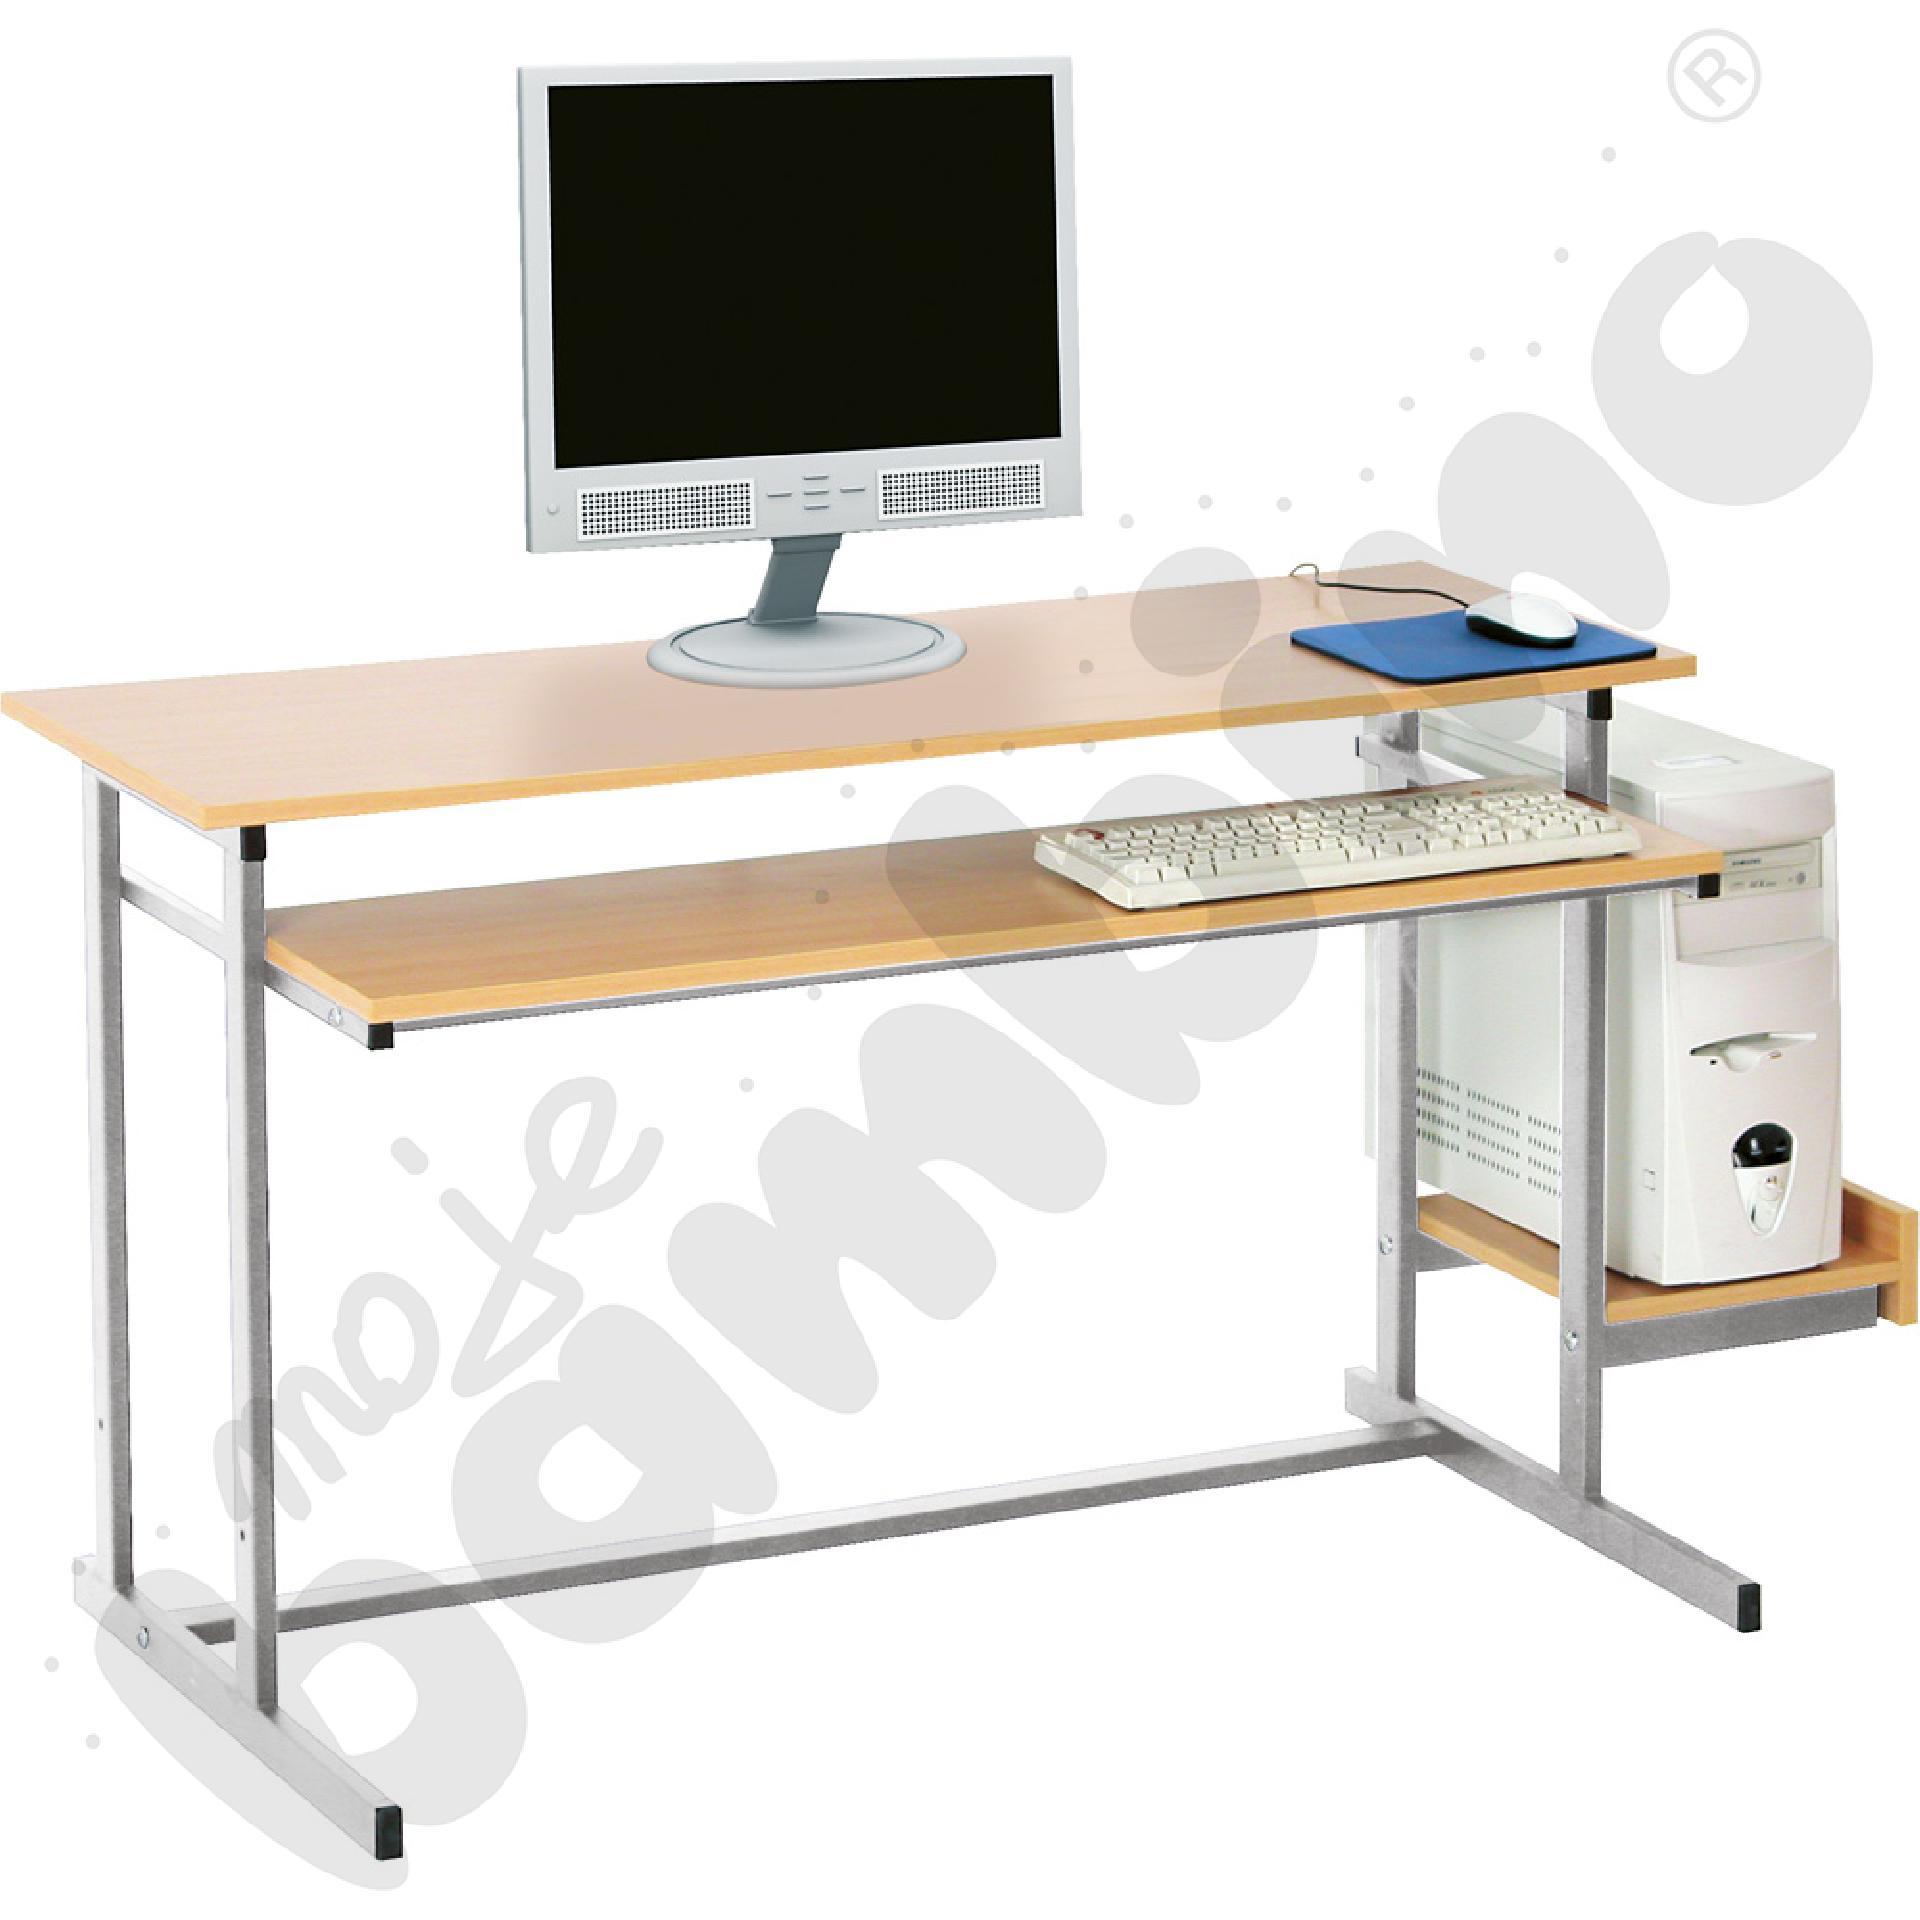 Półka na komputer do stolików NEO srebrna